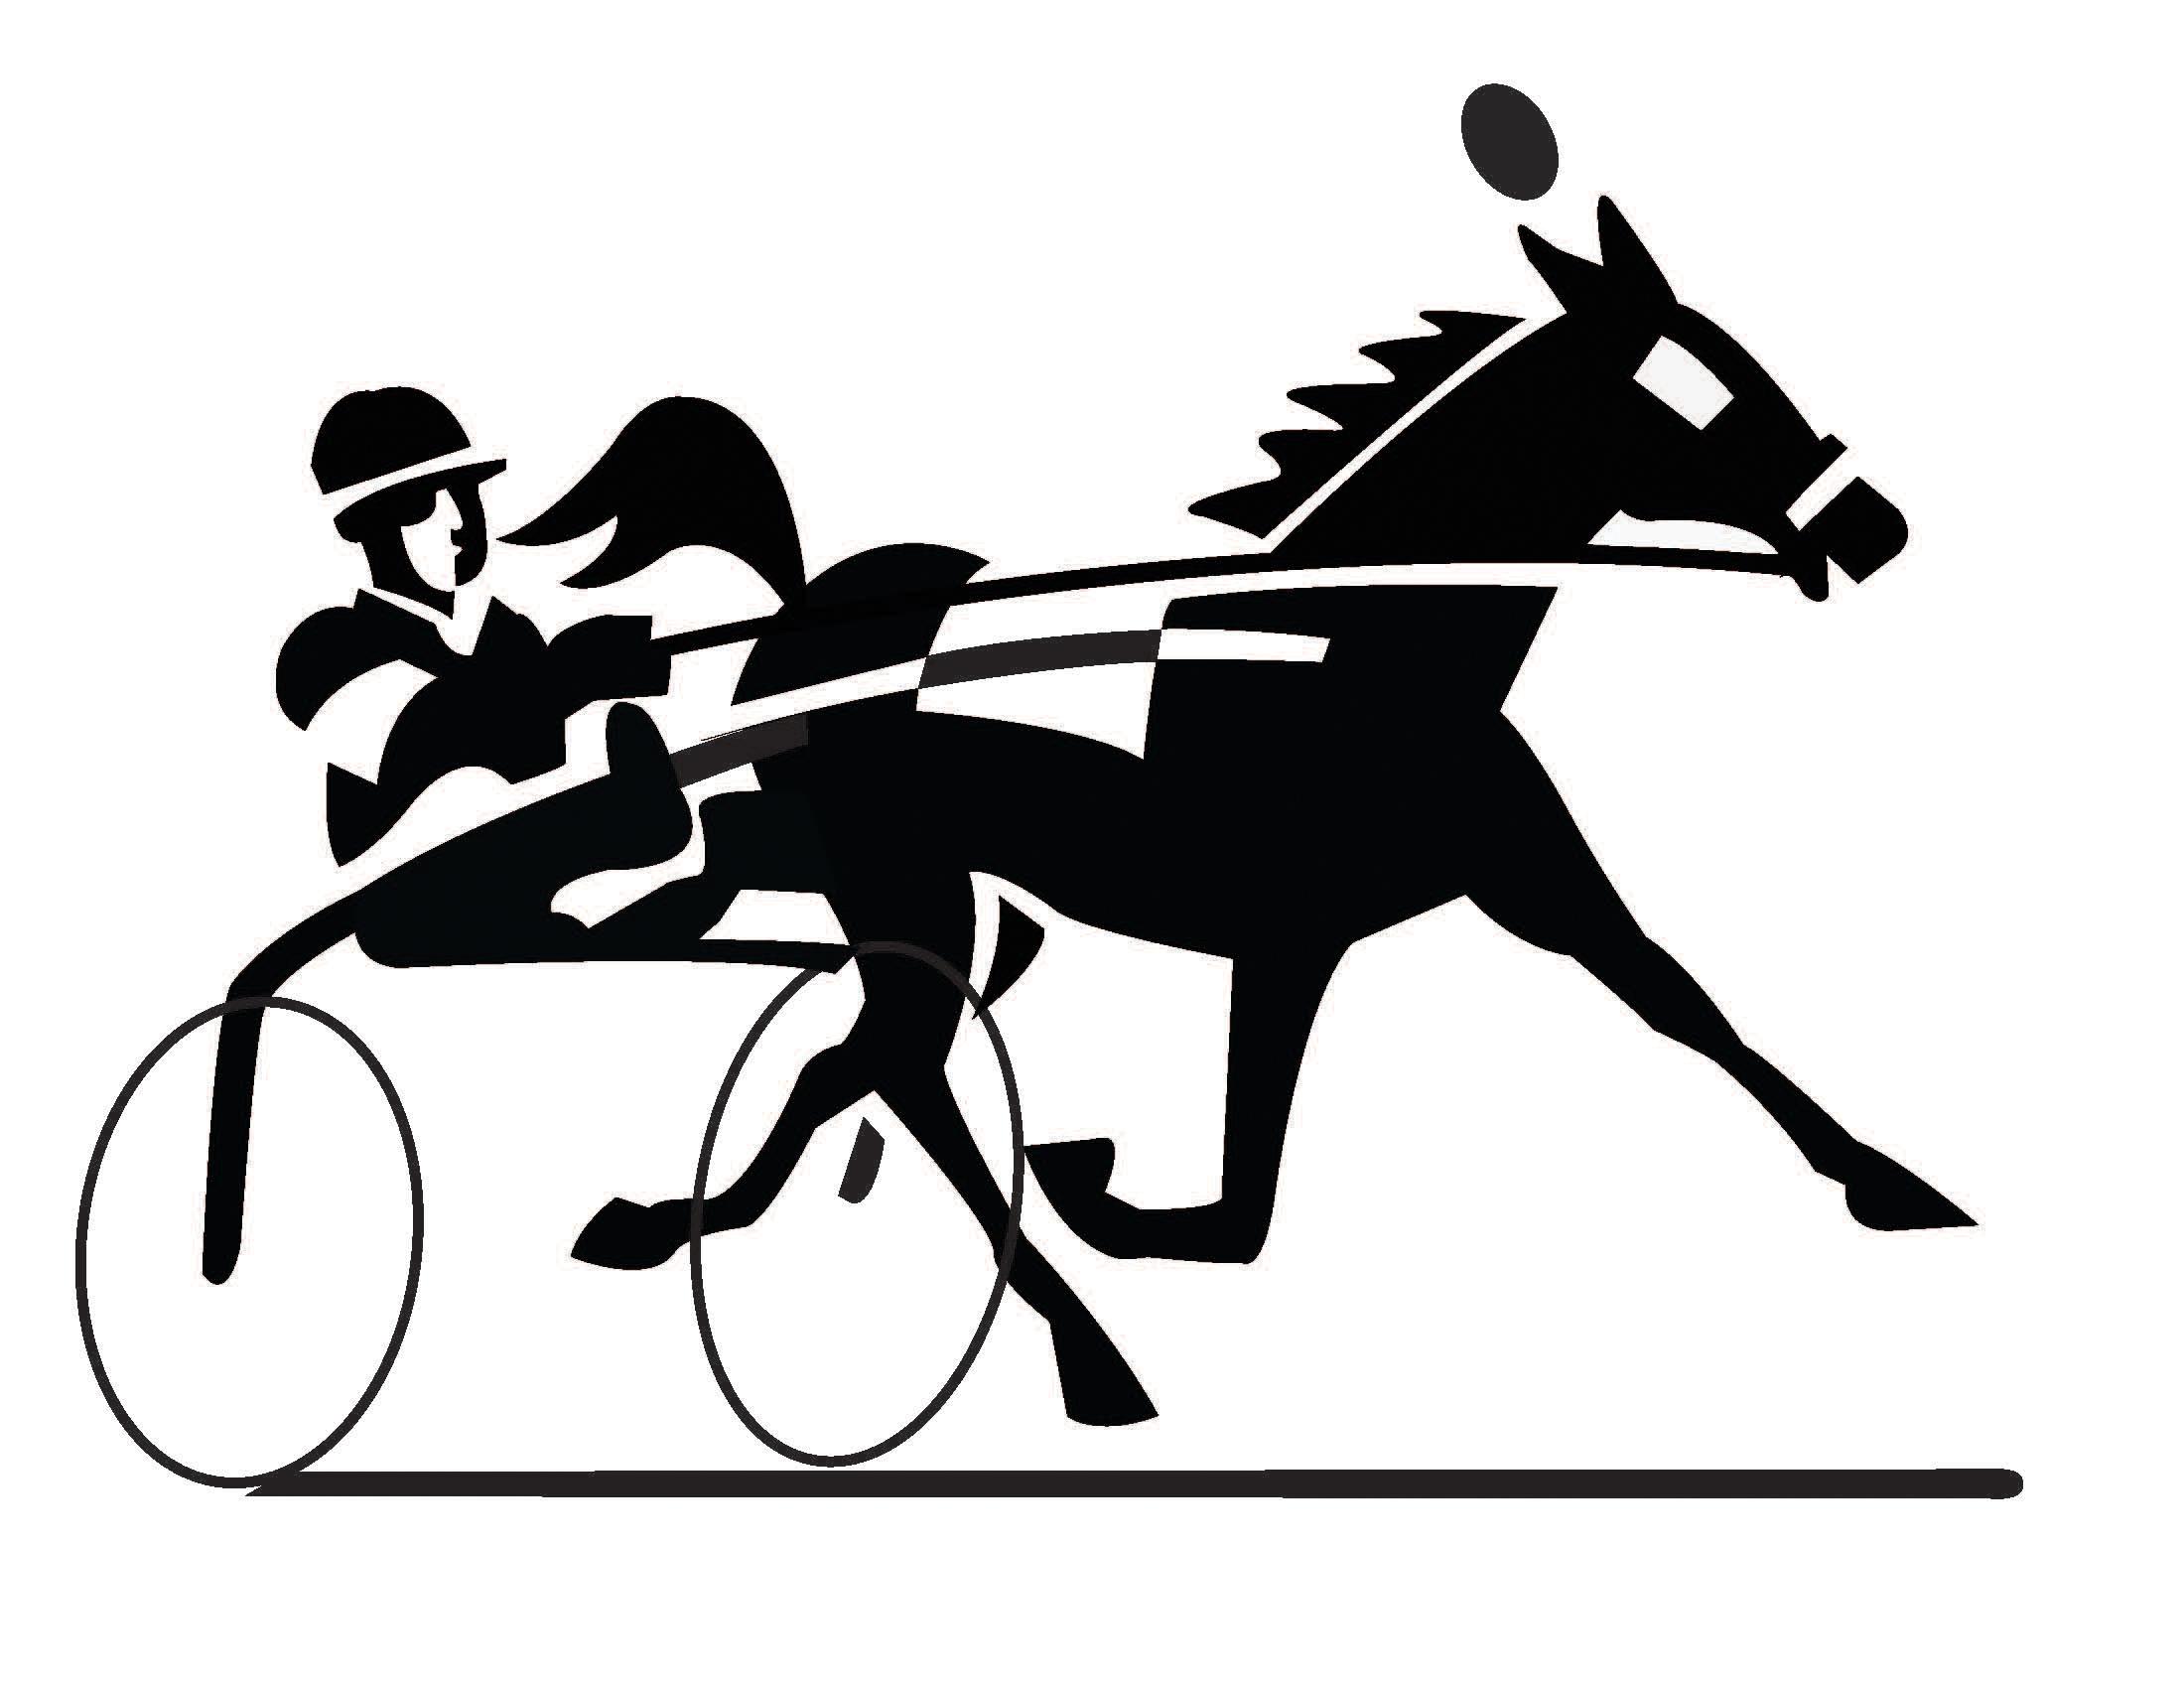 Horse racing racing clip art free